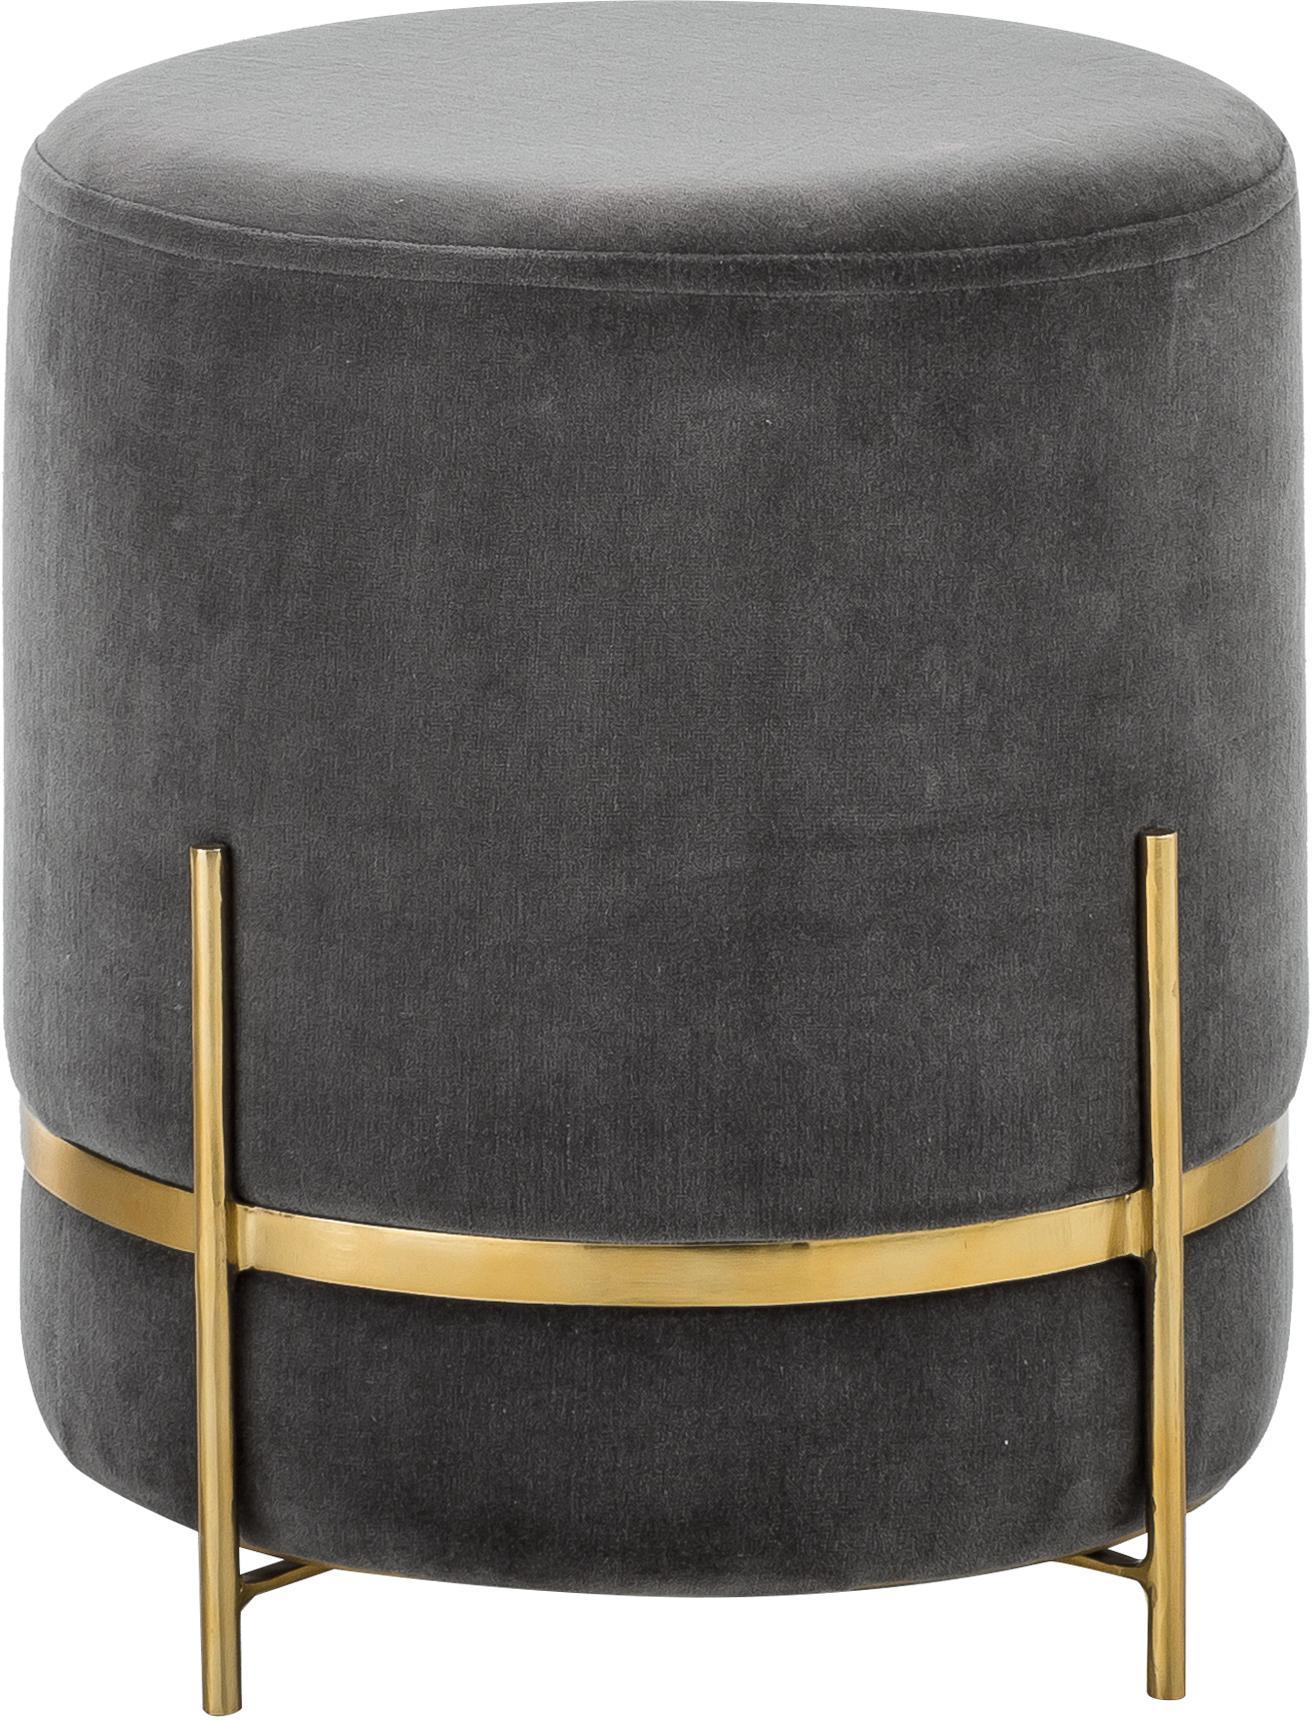 Puf de terciopelo Haven, Tapizado: terciopelo de algodón, Gris, dorado, Ø 38 x Al 45 cm